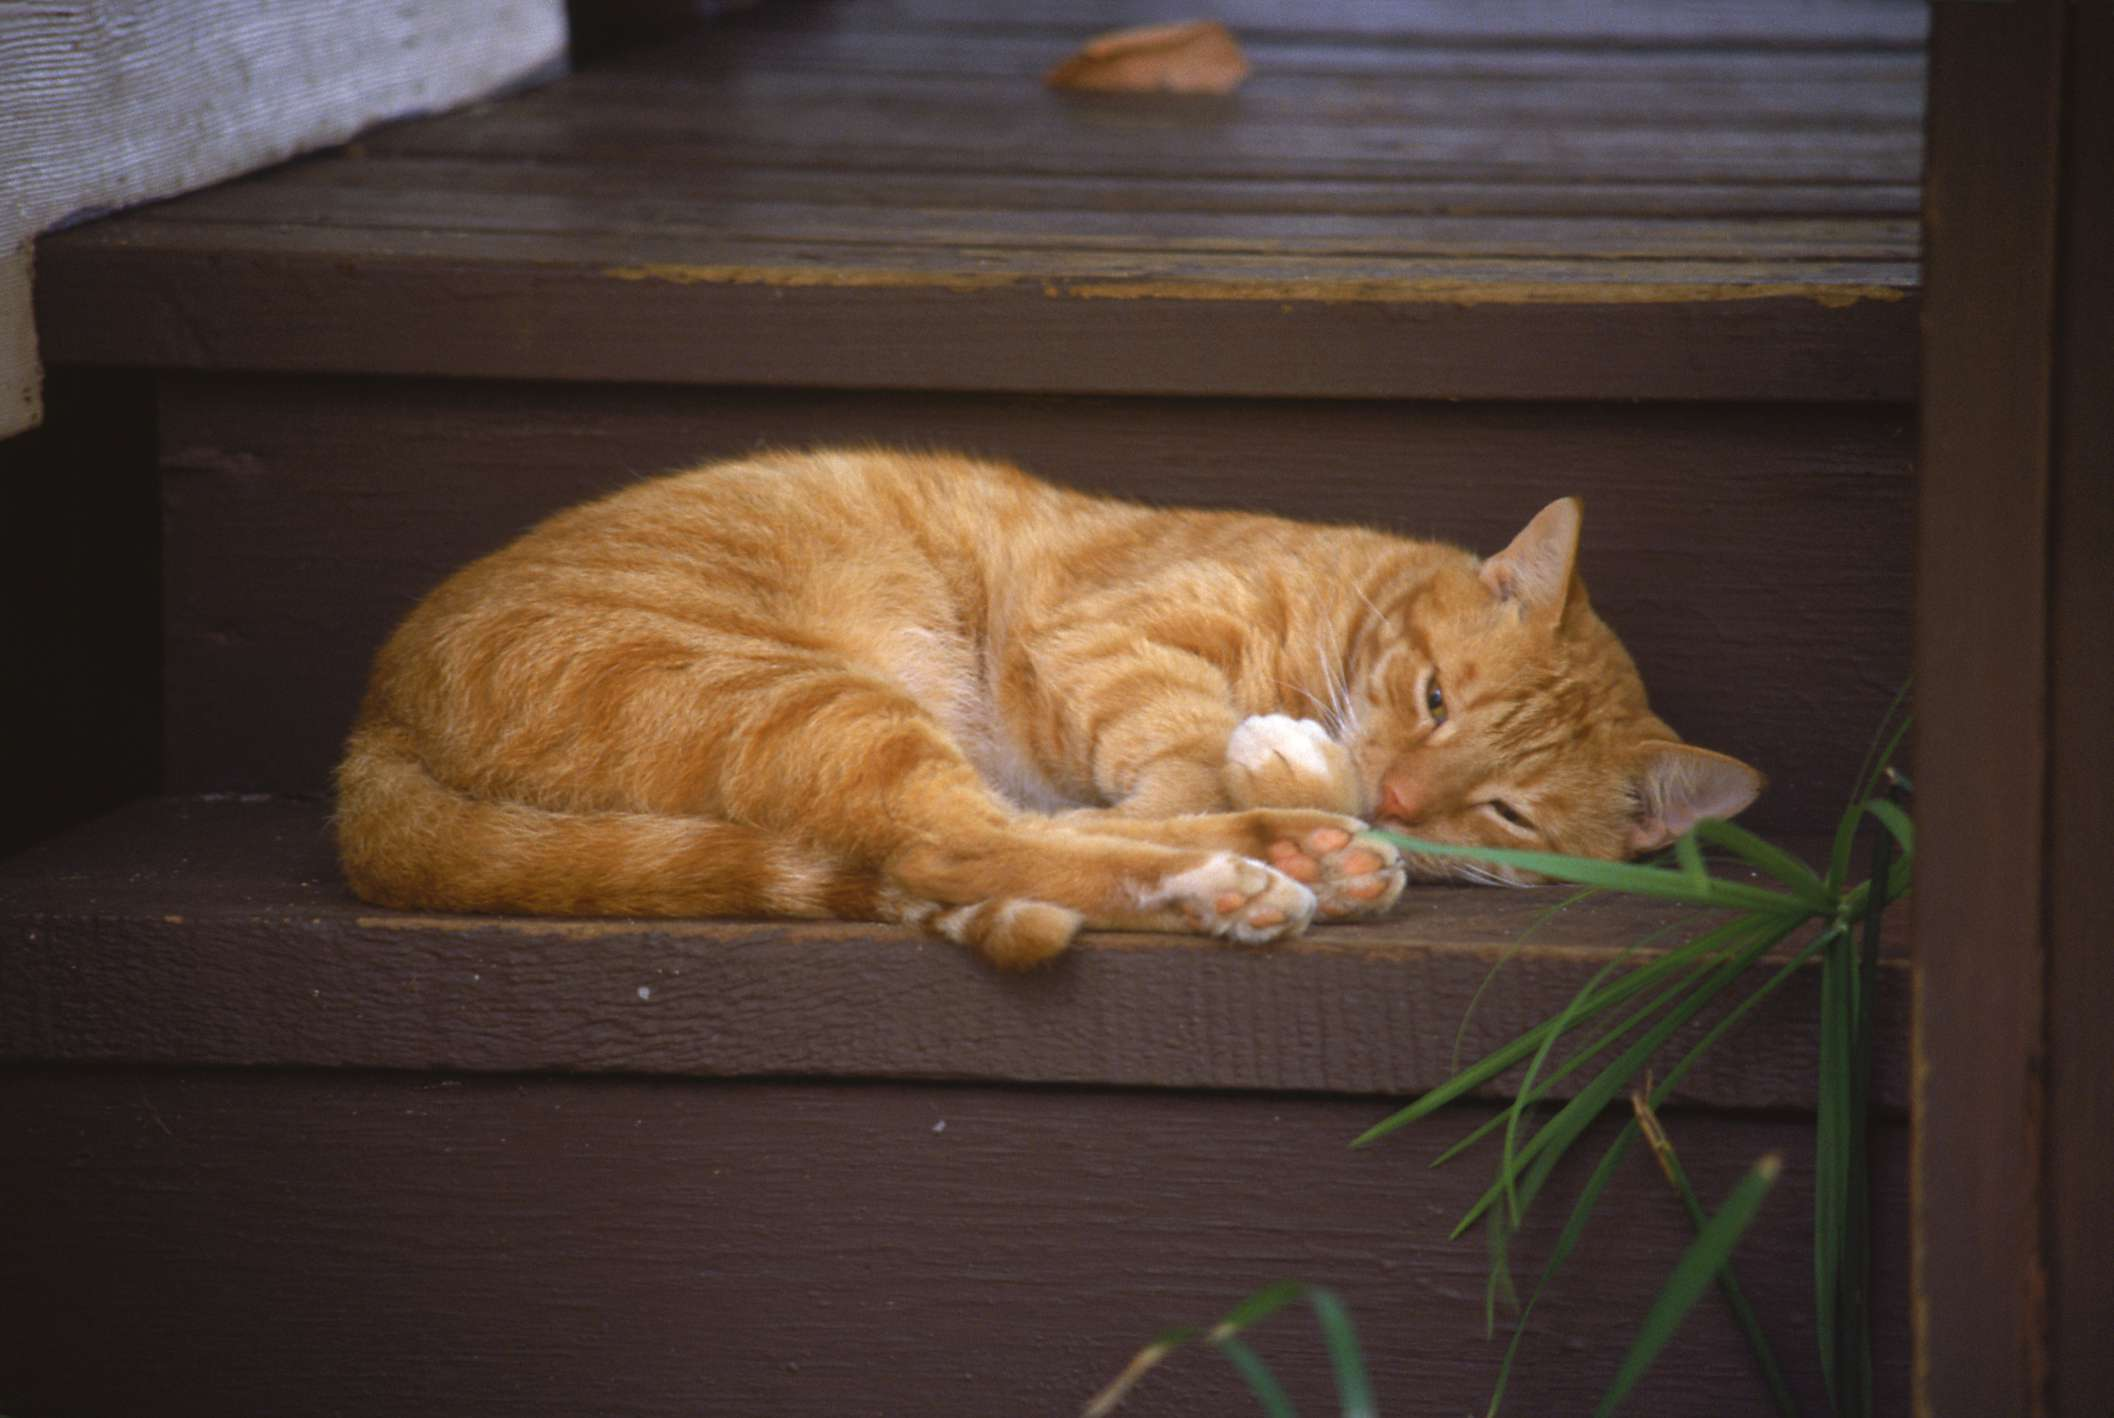 Cat sleeping on stairs, HI